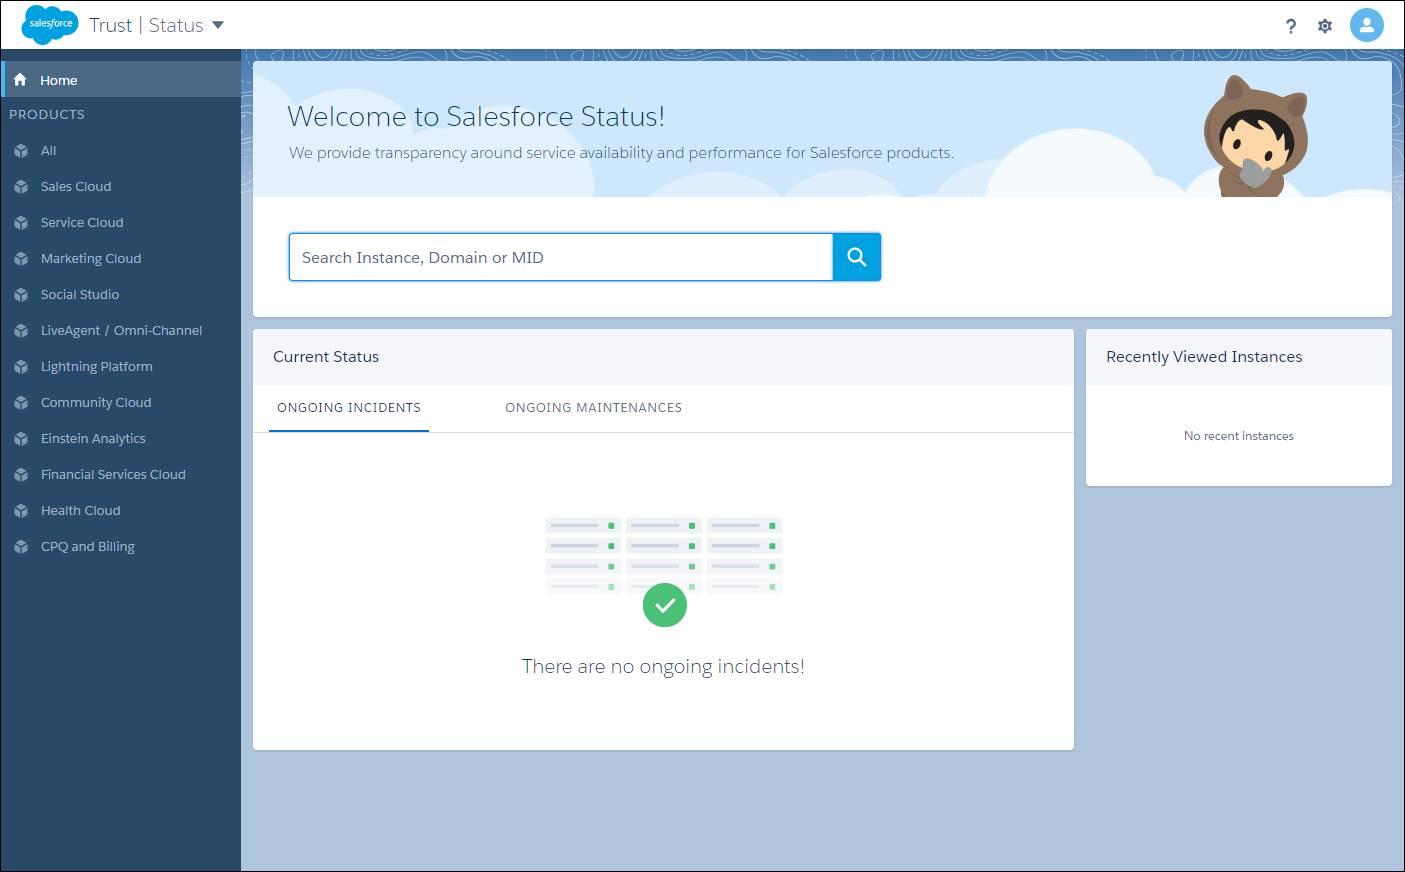 Salesforce Trust サイトの [ステータス] ページ。